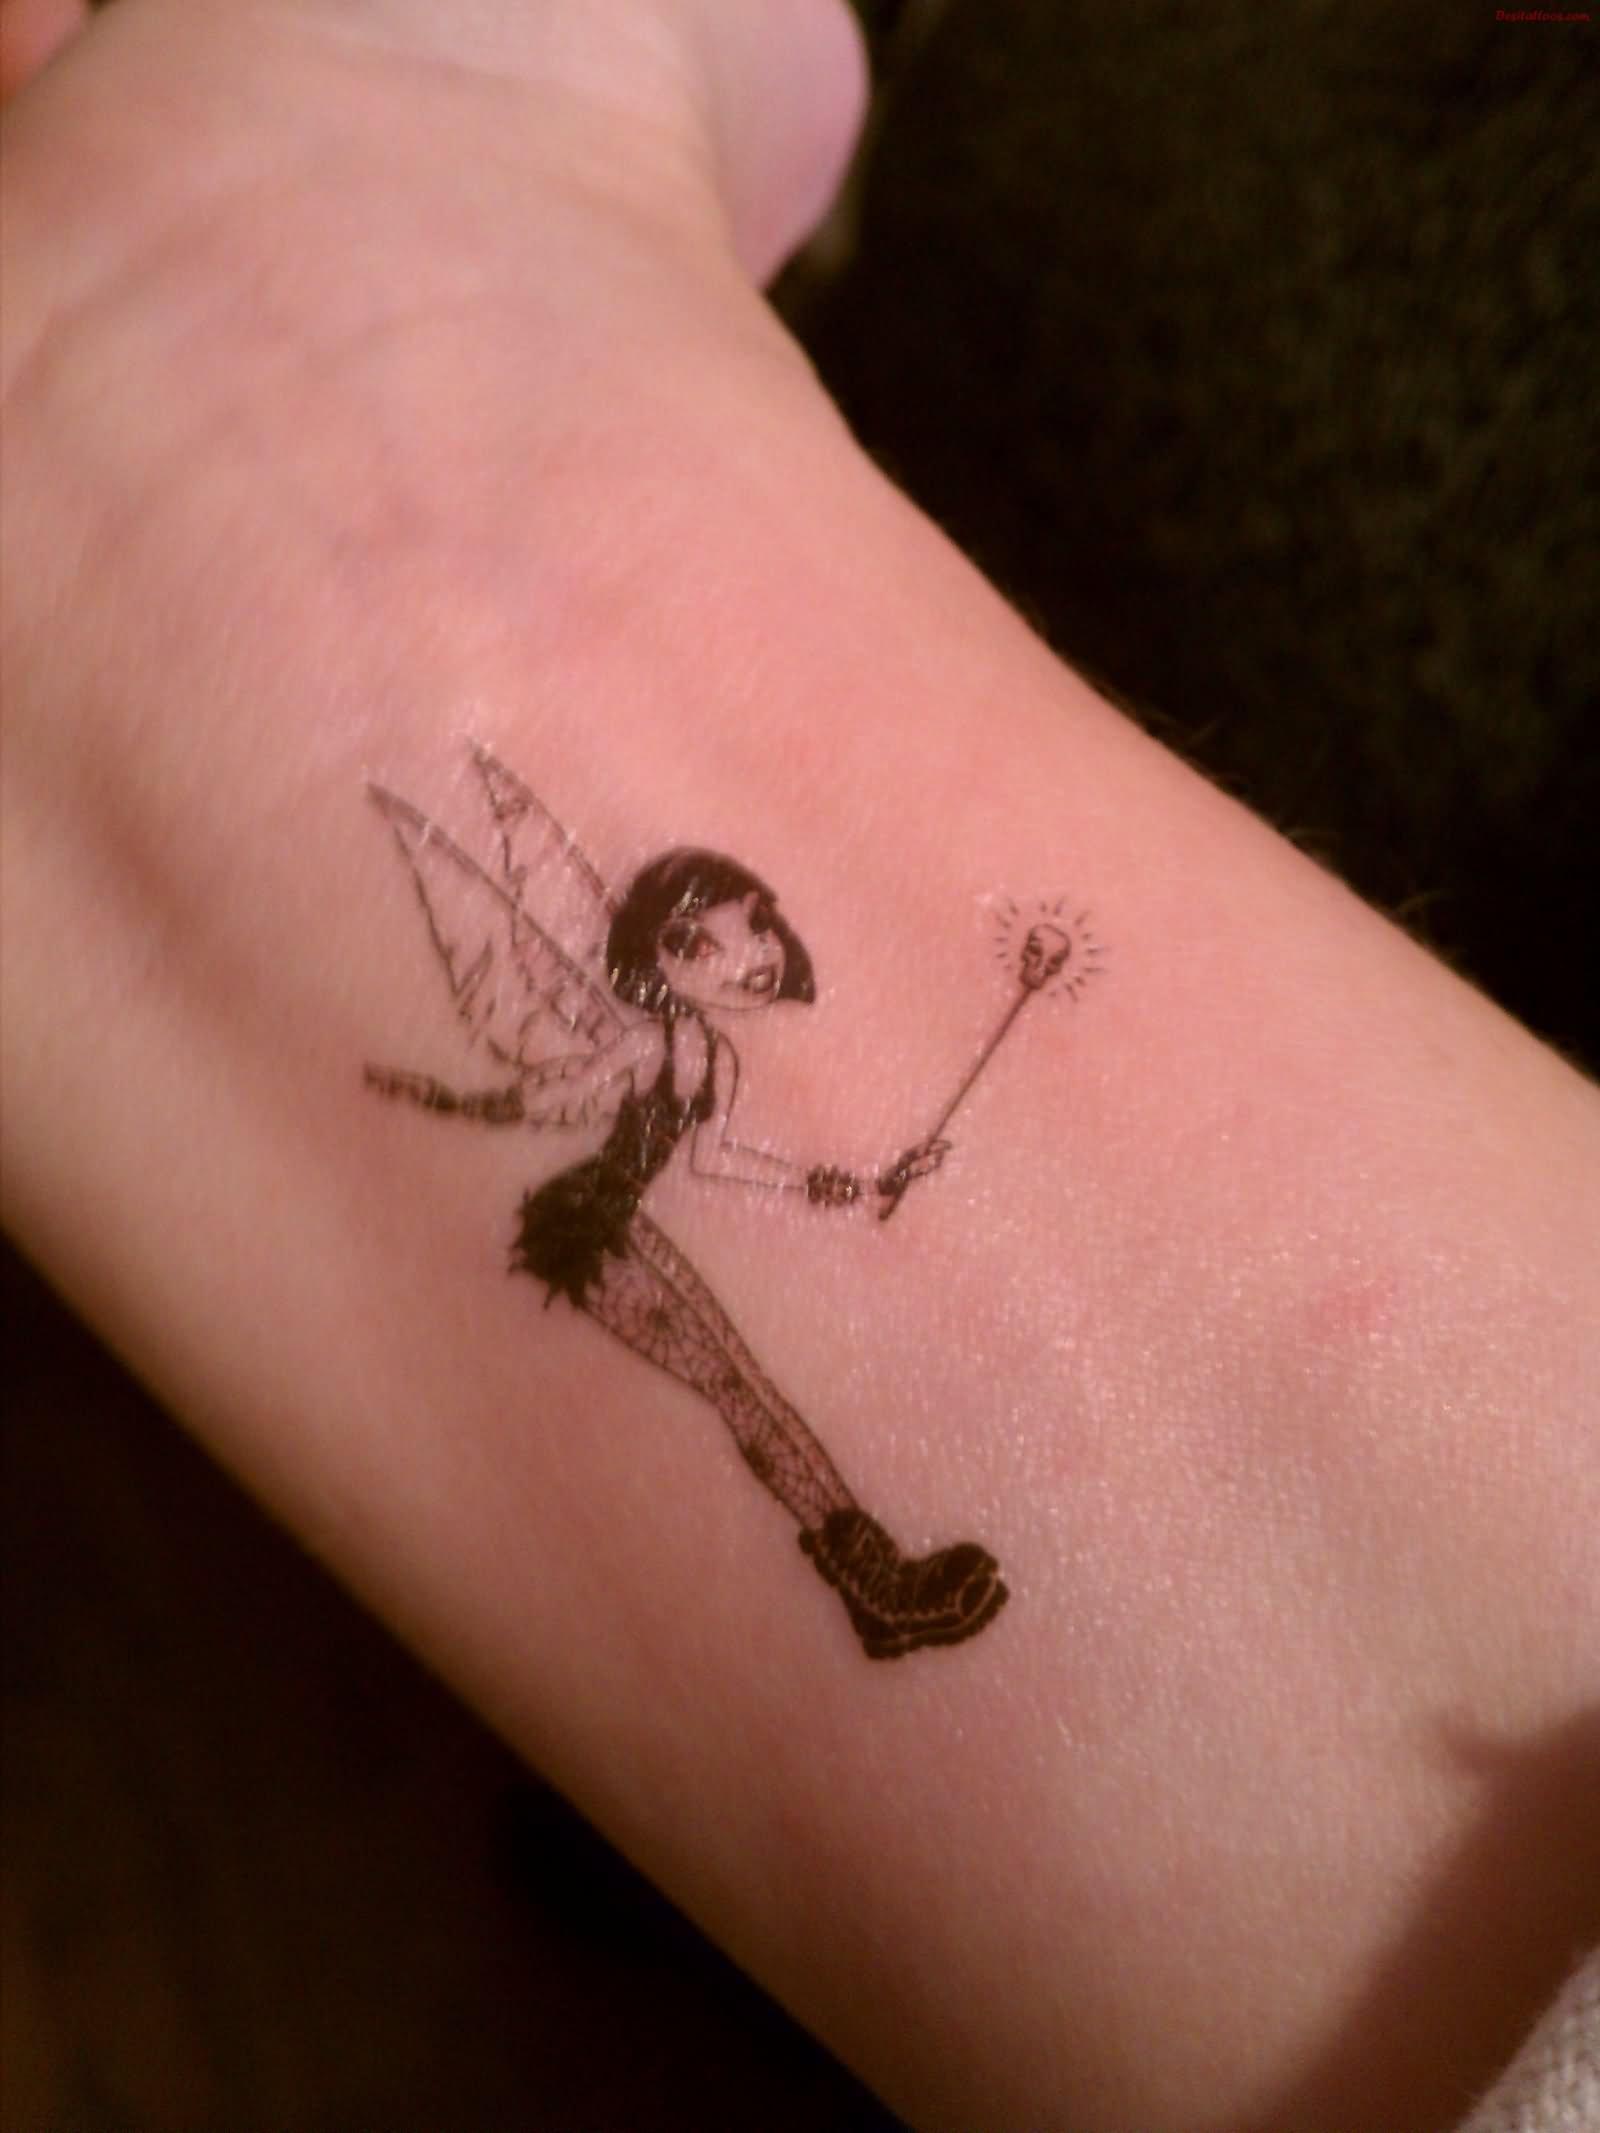 12 tinkerbell tattoos for wrist. Black Bedroom Furniture Sets. Home Design Ideas